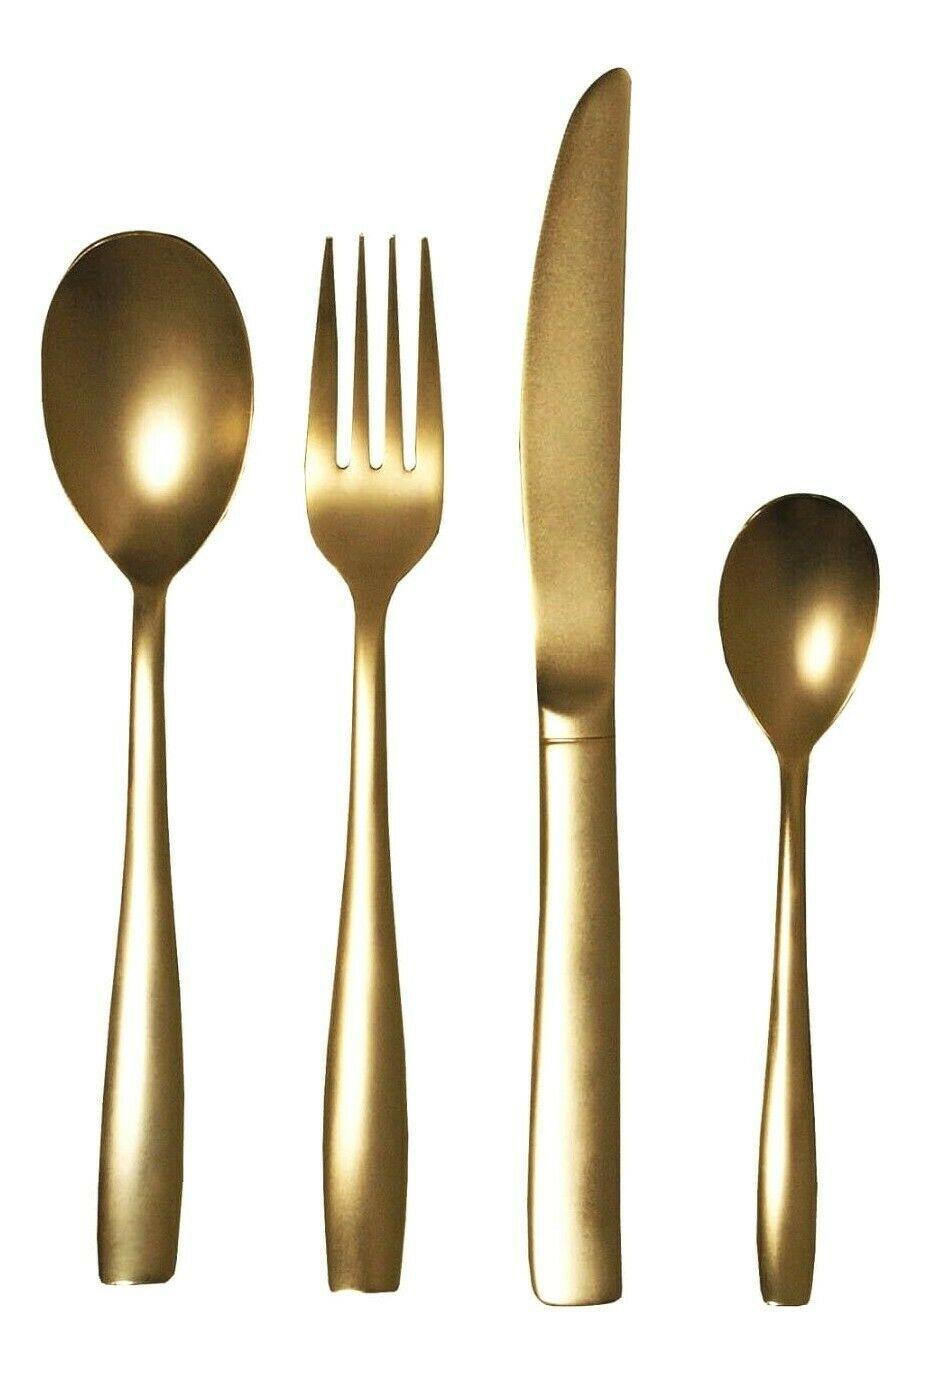 Seletti TWD Real Gold Plated Midas Cutlery Flatware 24 Piece Set $296.00 NIB